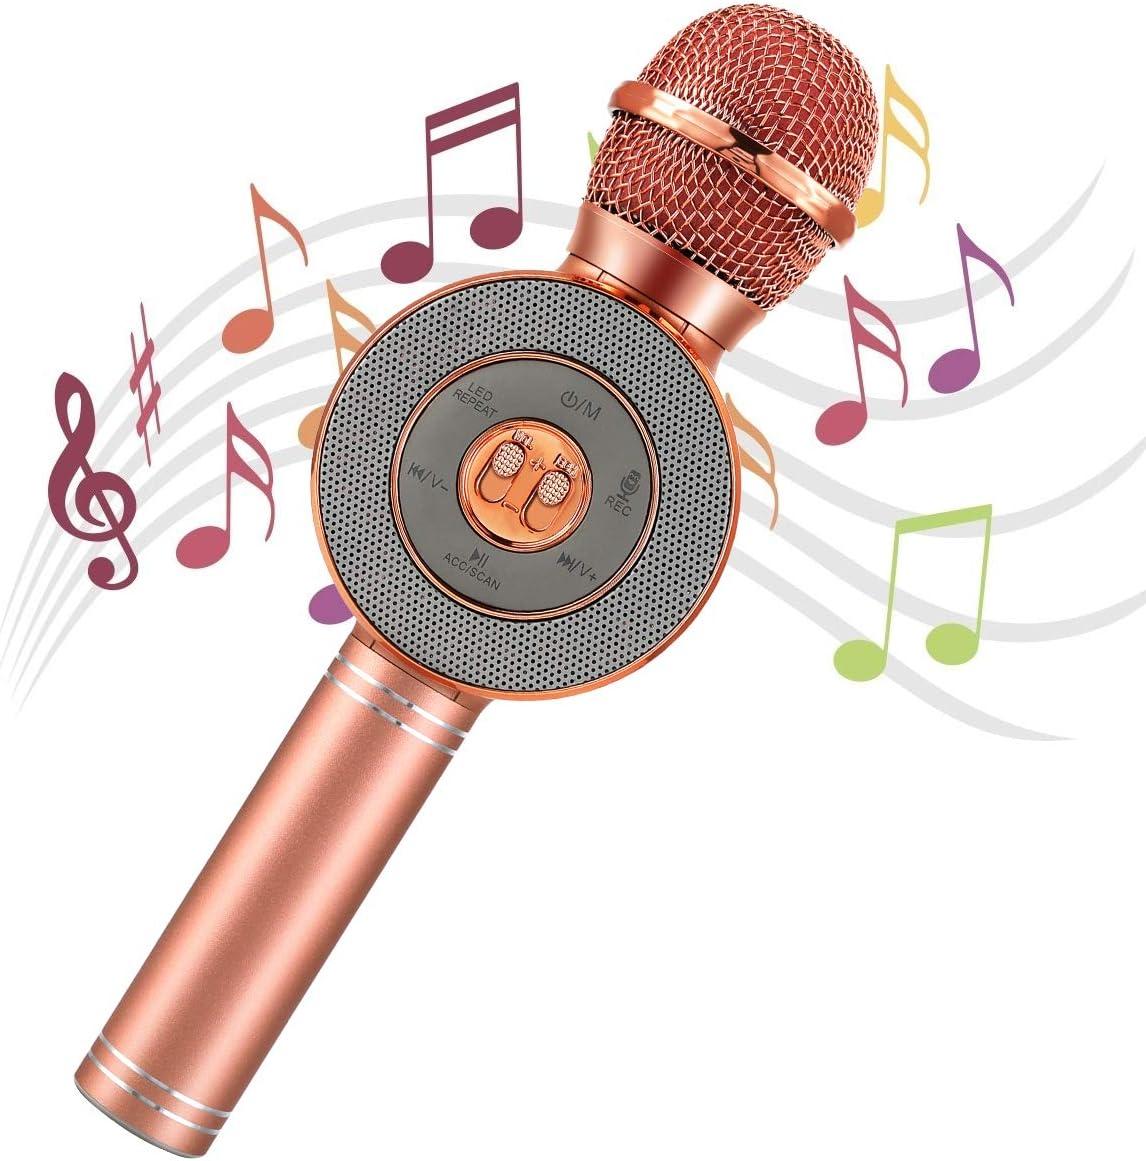 AGPTEK Micrófono Karaoke Bluetooth, 4 en 1 Micrófono Inalámbrico Karaoke Portátil con Altavoces y Luces LED, Grabador, Ideal para Niños Canta Partido Música, KTV, Rosa